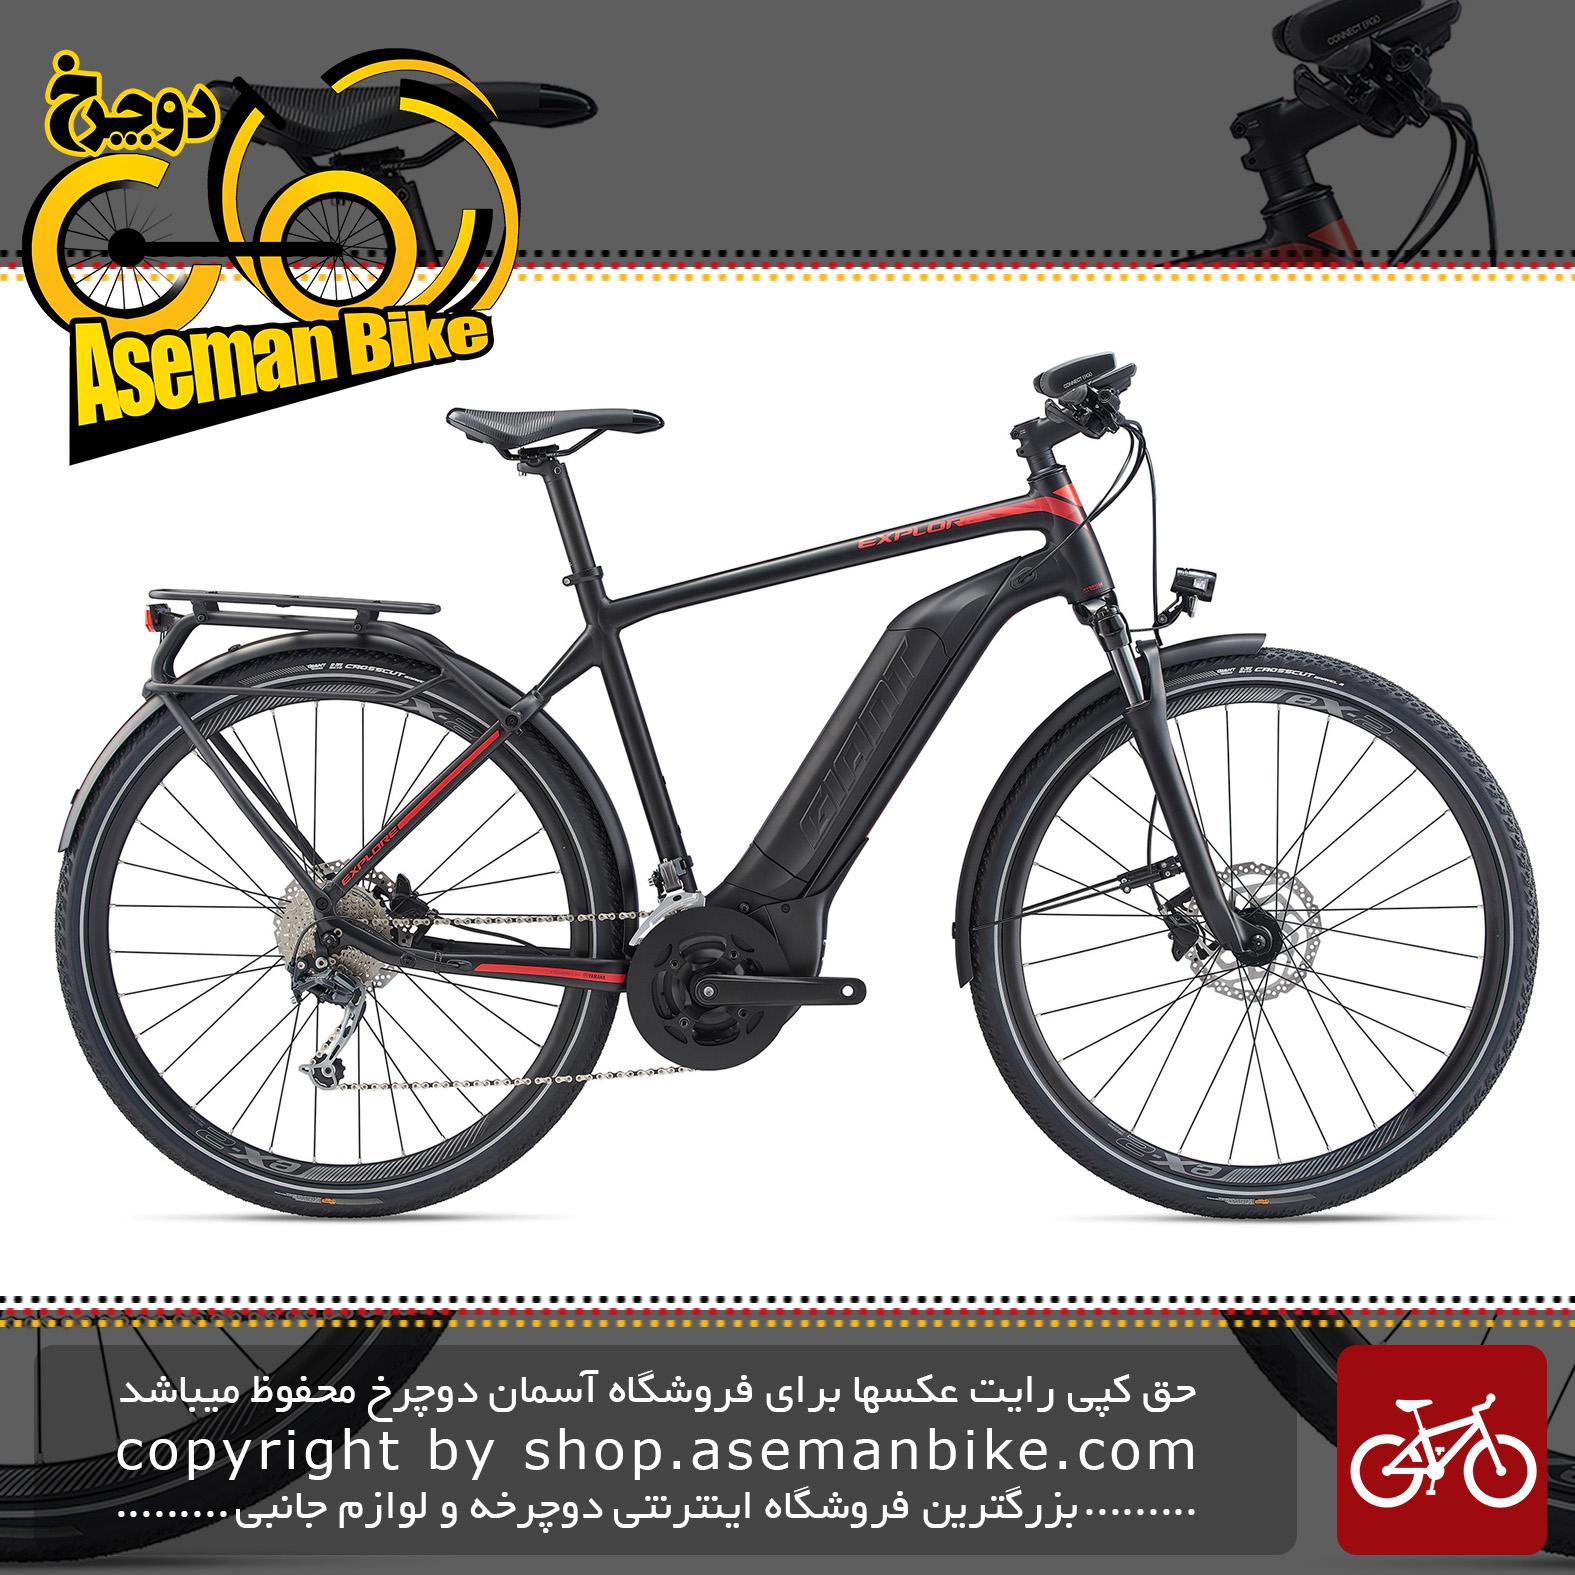 دوچرخه دومنظوره برقی جاینت مدل اکسپلور ای پلاس 2 جی تی اس 2020 Giant Trekking Bicycle Explore E+ 2 GTS 2020